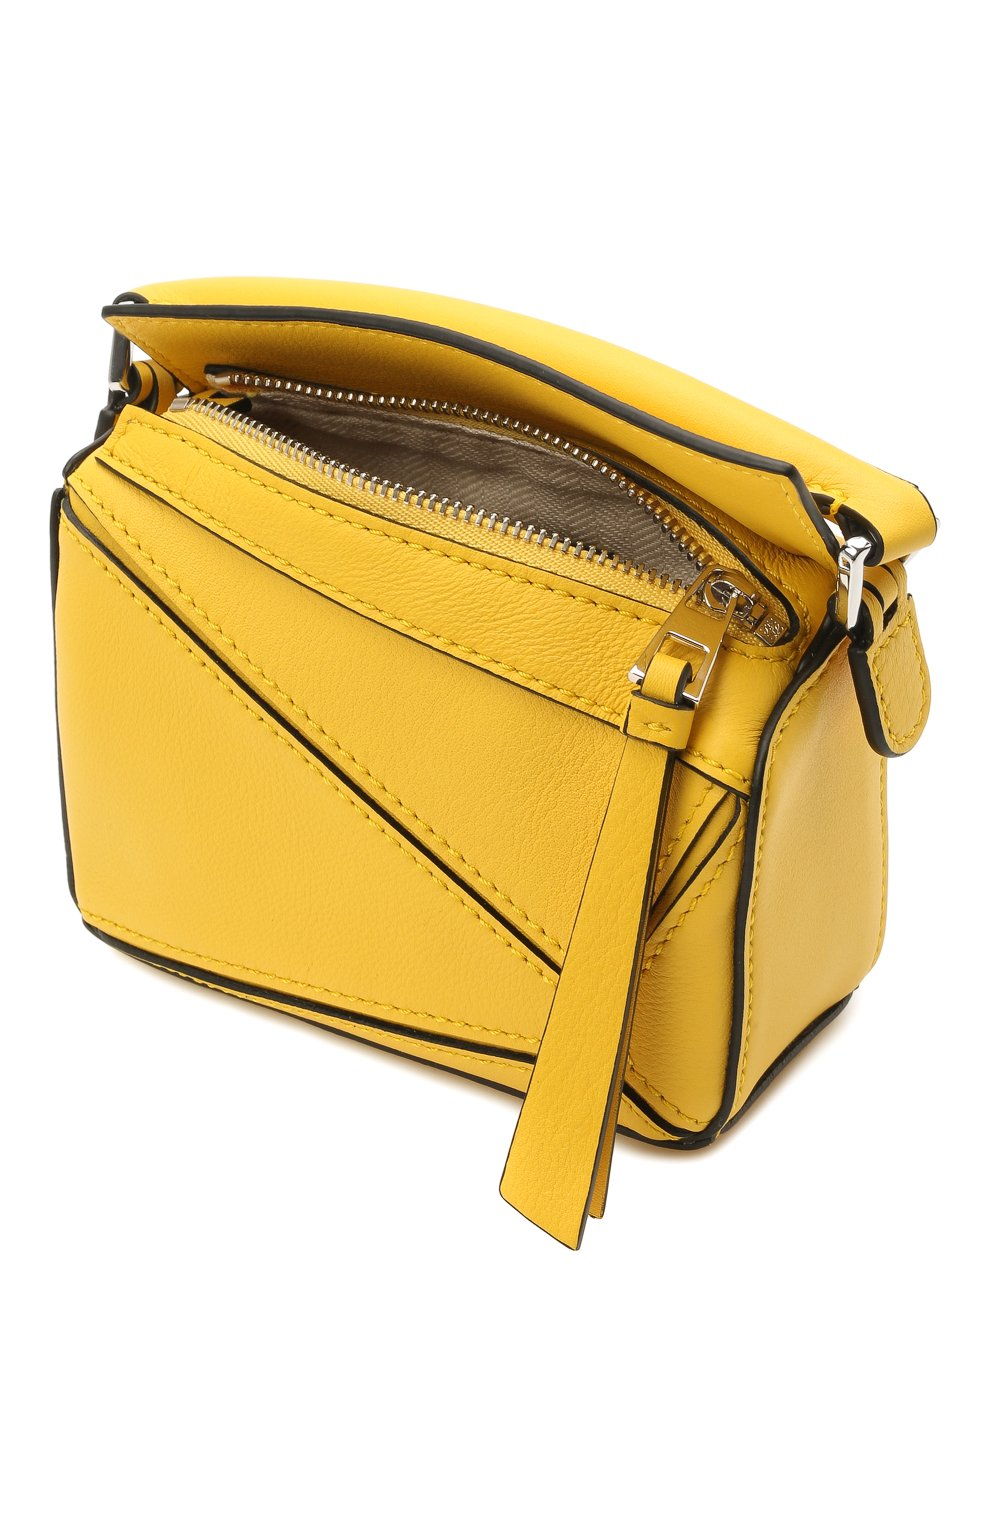 Женская сумка puzzle nano LOEWE желтого цвета, арт. A510U98X01 | Фото 4 (Ремень/цепочка: С цепочкой, На ремешке; Сумки-технические: Сумки top-handle; Материал: Натуральная кожа; Размер: mini)